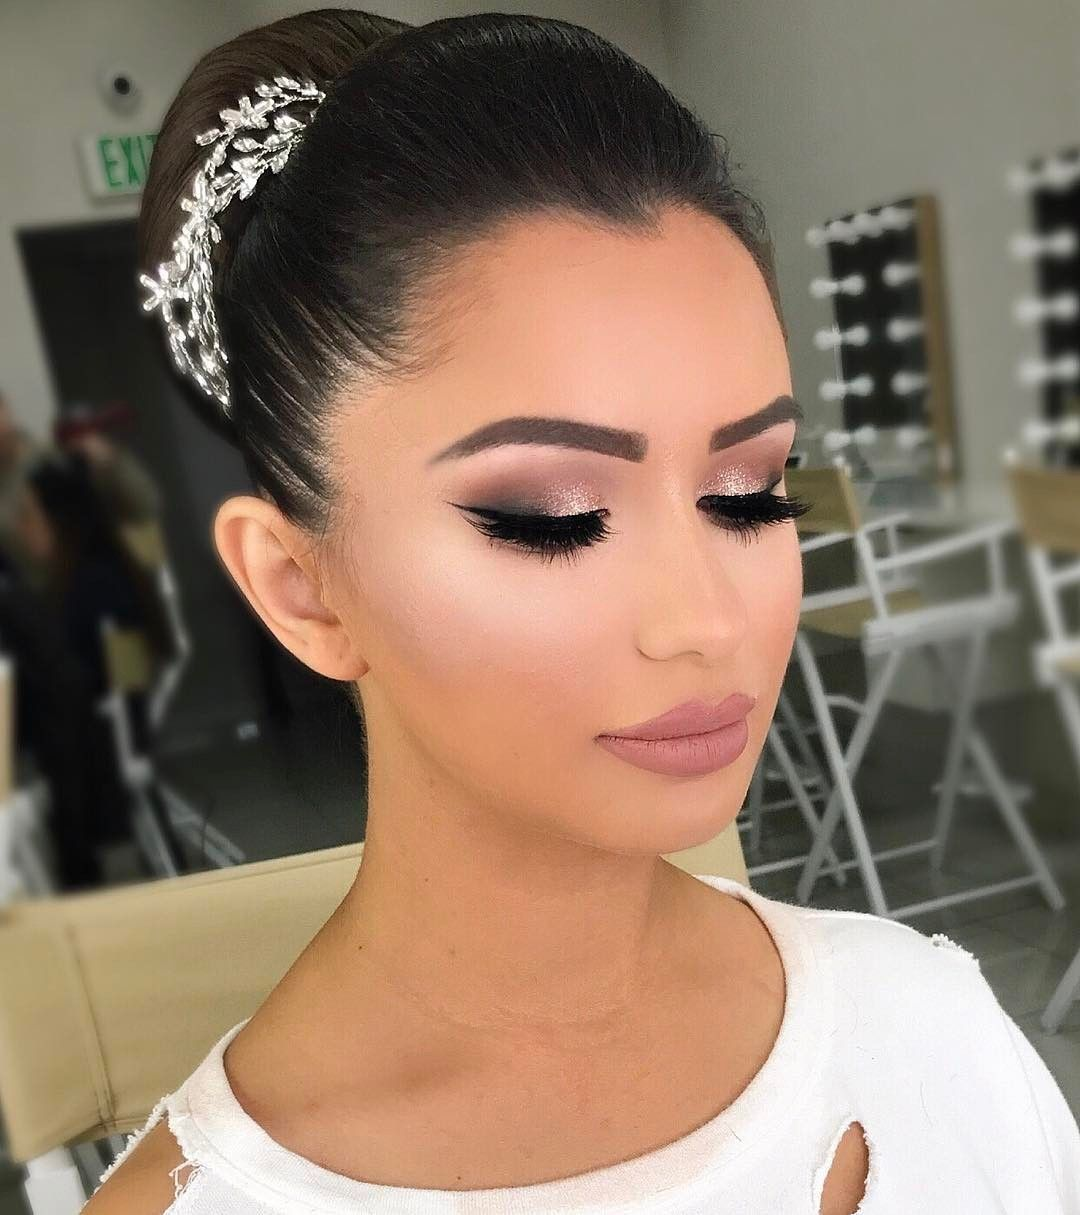 Bridal glam 💎 #vanitymakeup in 2020 | Wedding makeup for ...